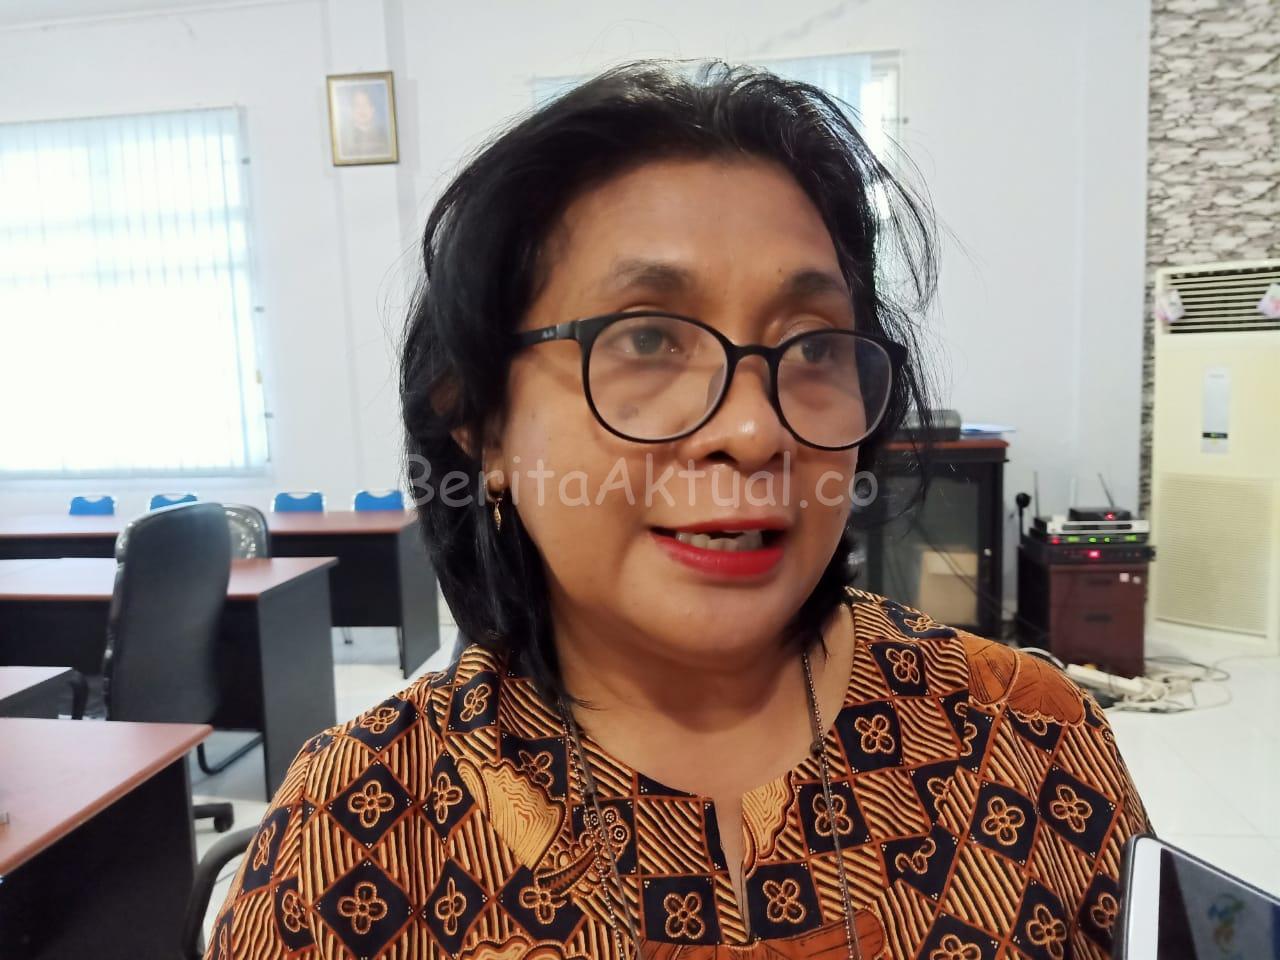 Pengangguran Terbuka di Papua Barat 484.175 Orang, Meningkat 5,01 Persen 20 IMG 20200506 WA0000